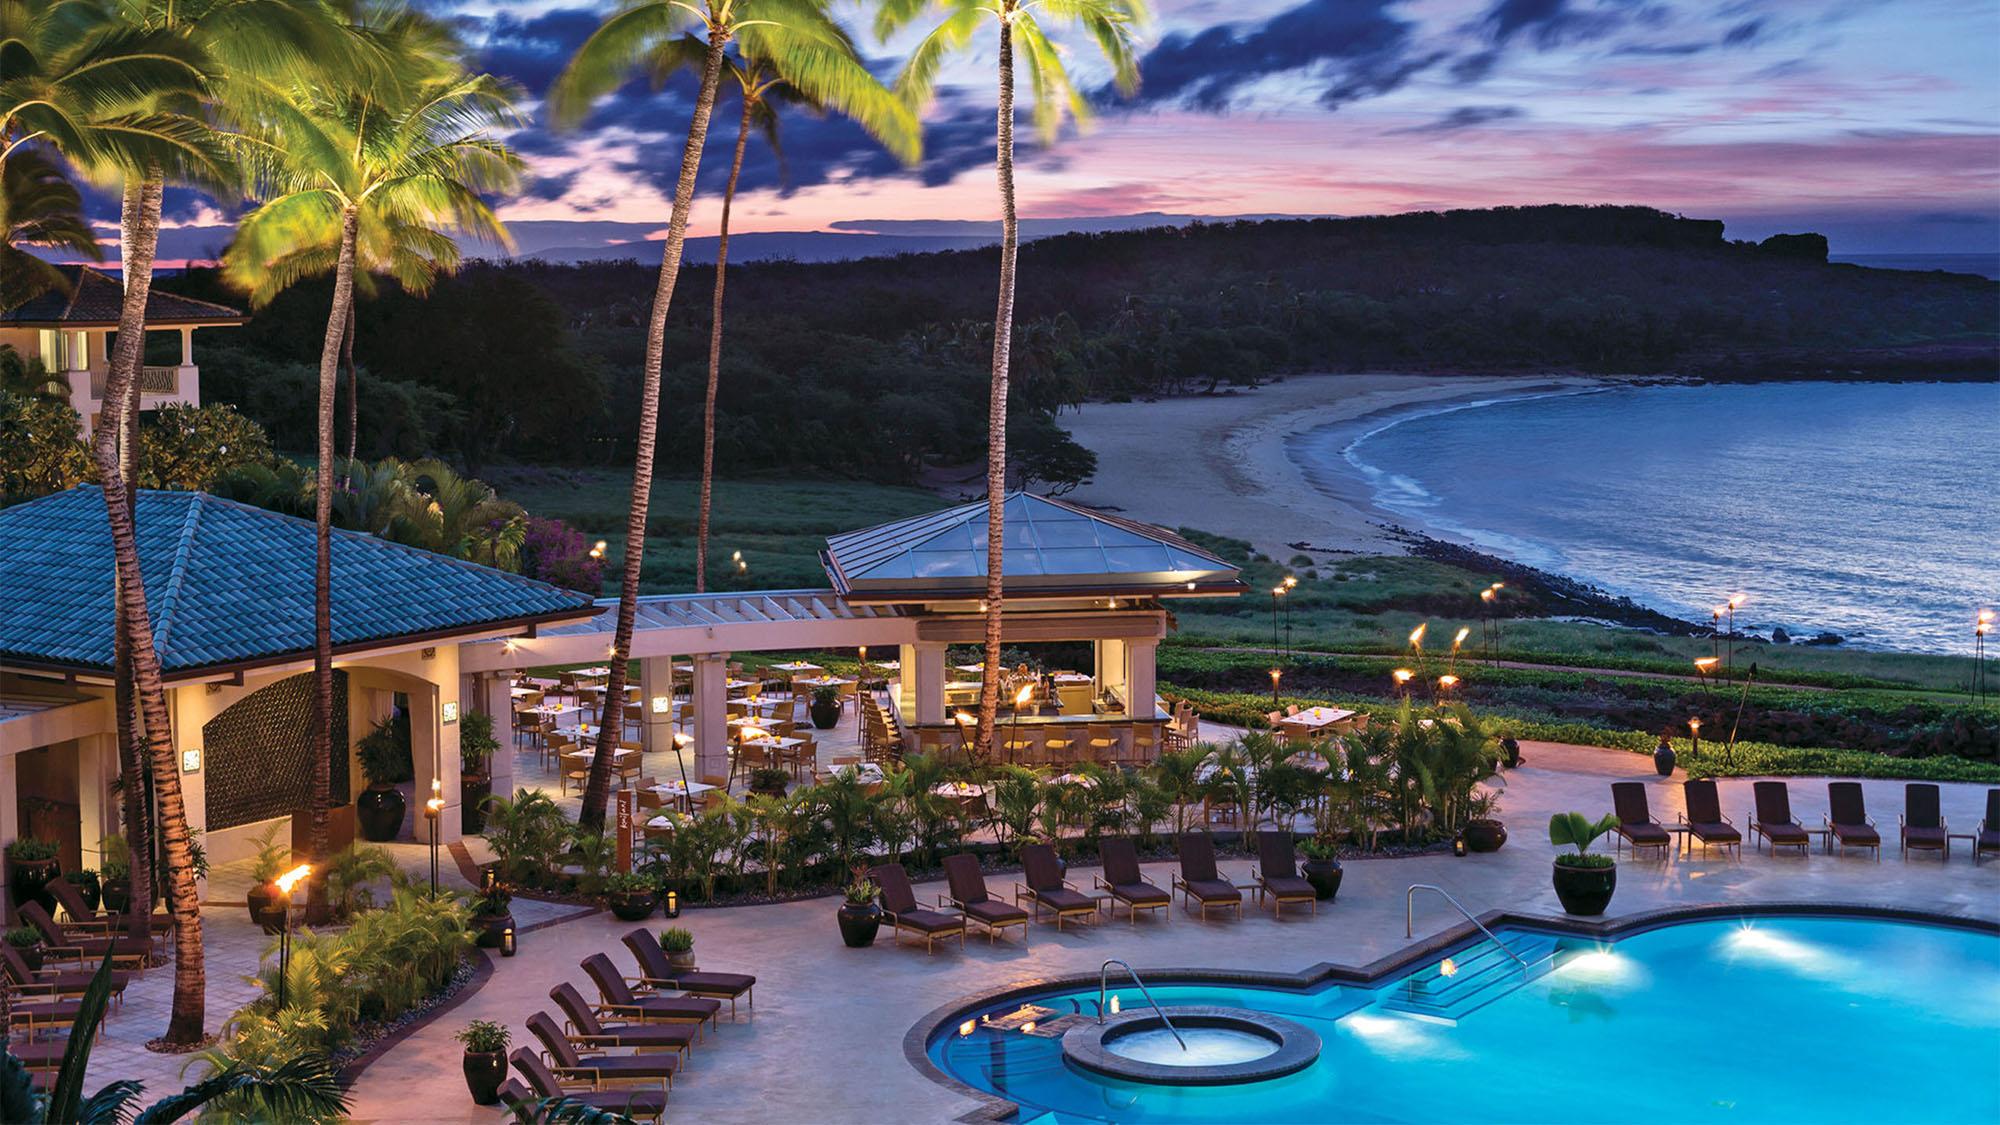 Ellison S Plans For Lanai Taking Shape Travel Weekly